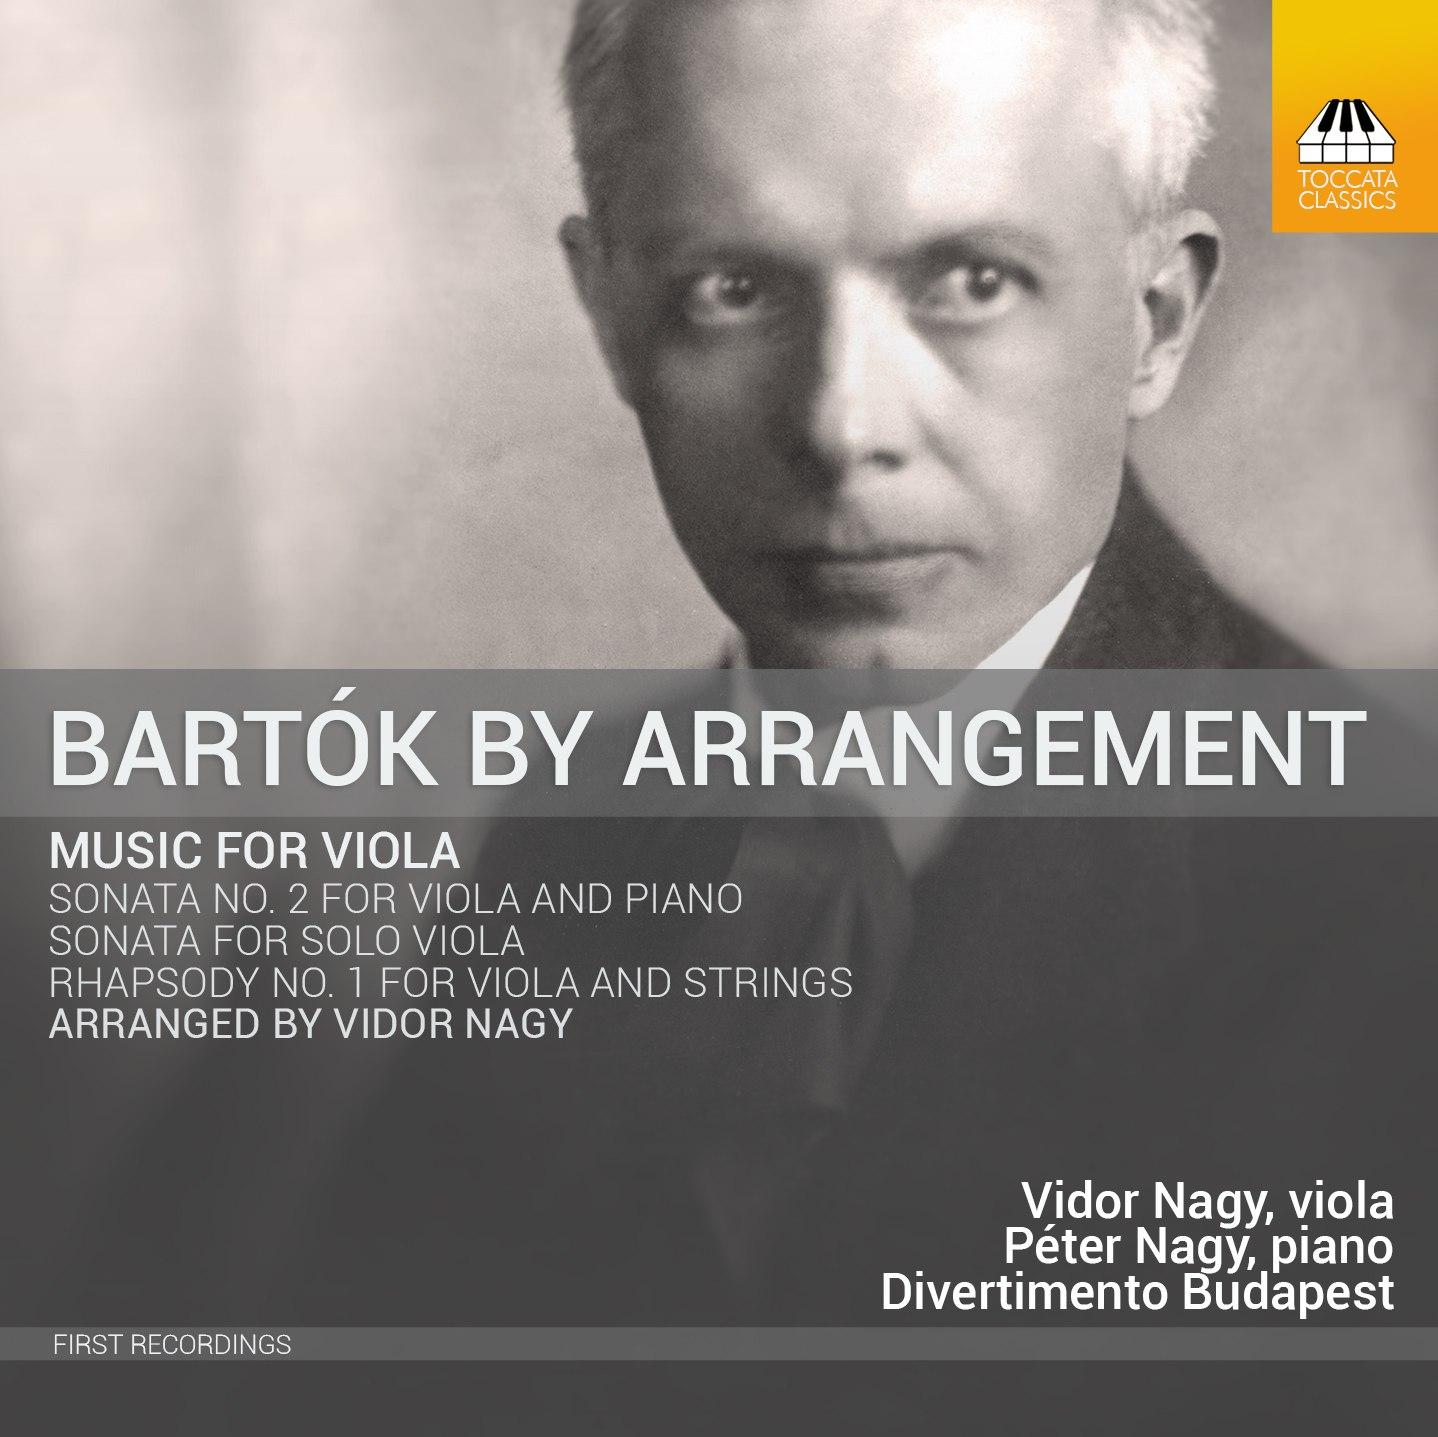 Bartók By Arrangement: Music for Viola